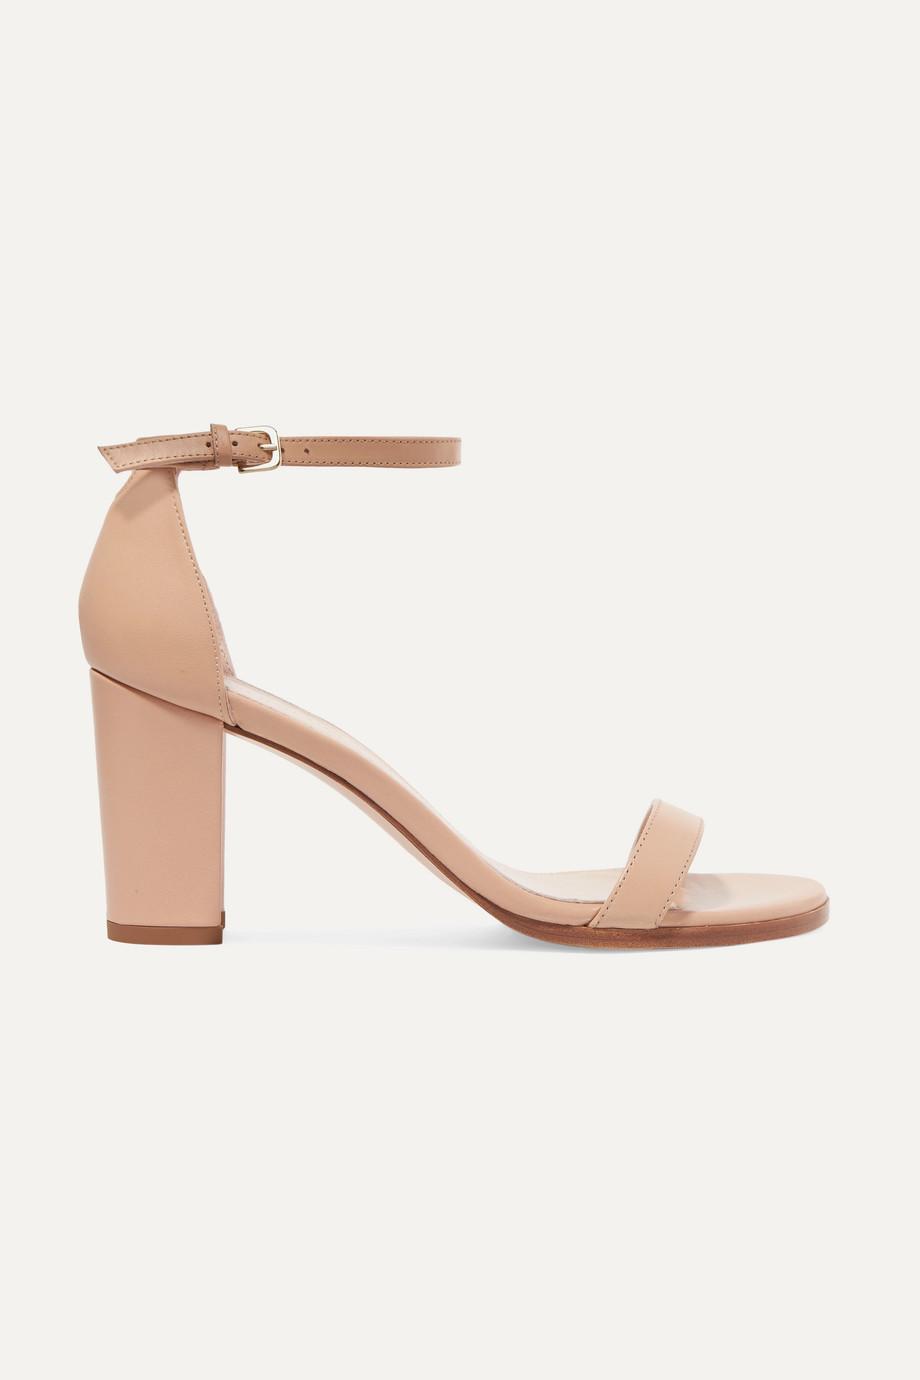 Stuart Weitzman NearlyNude leather sandals